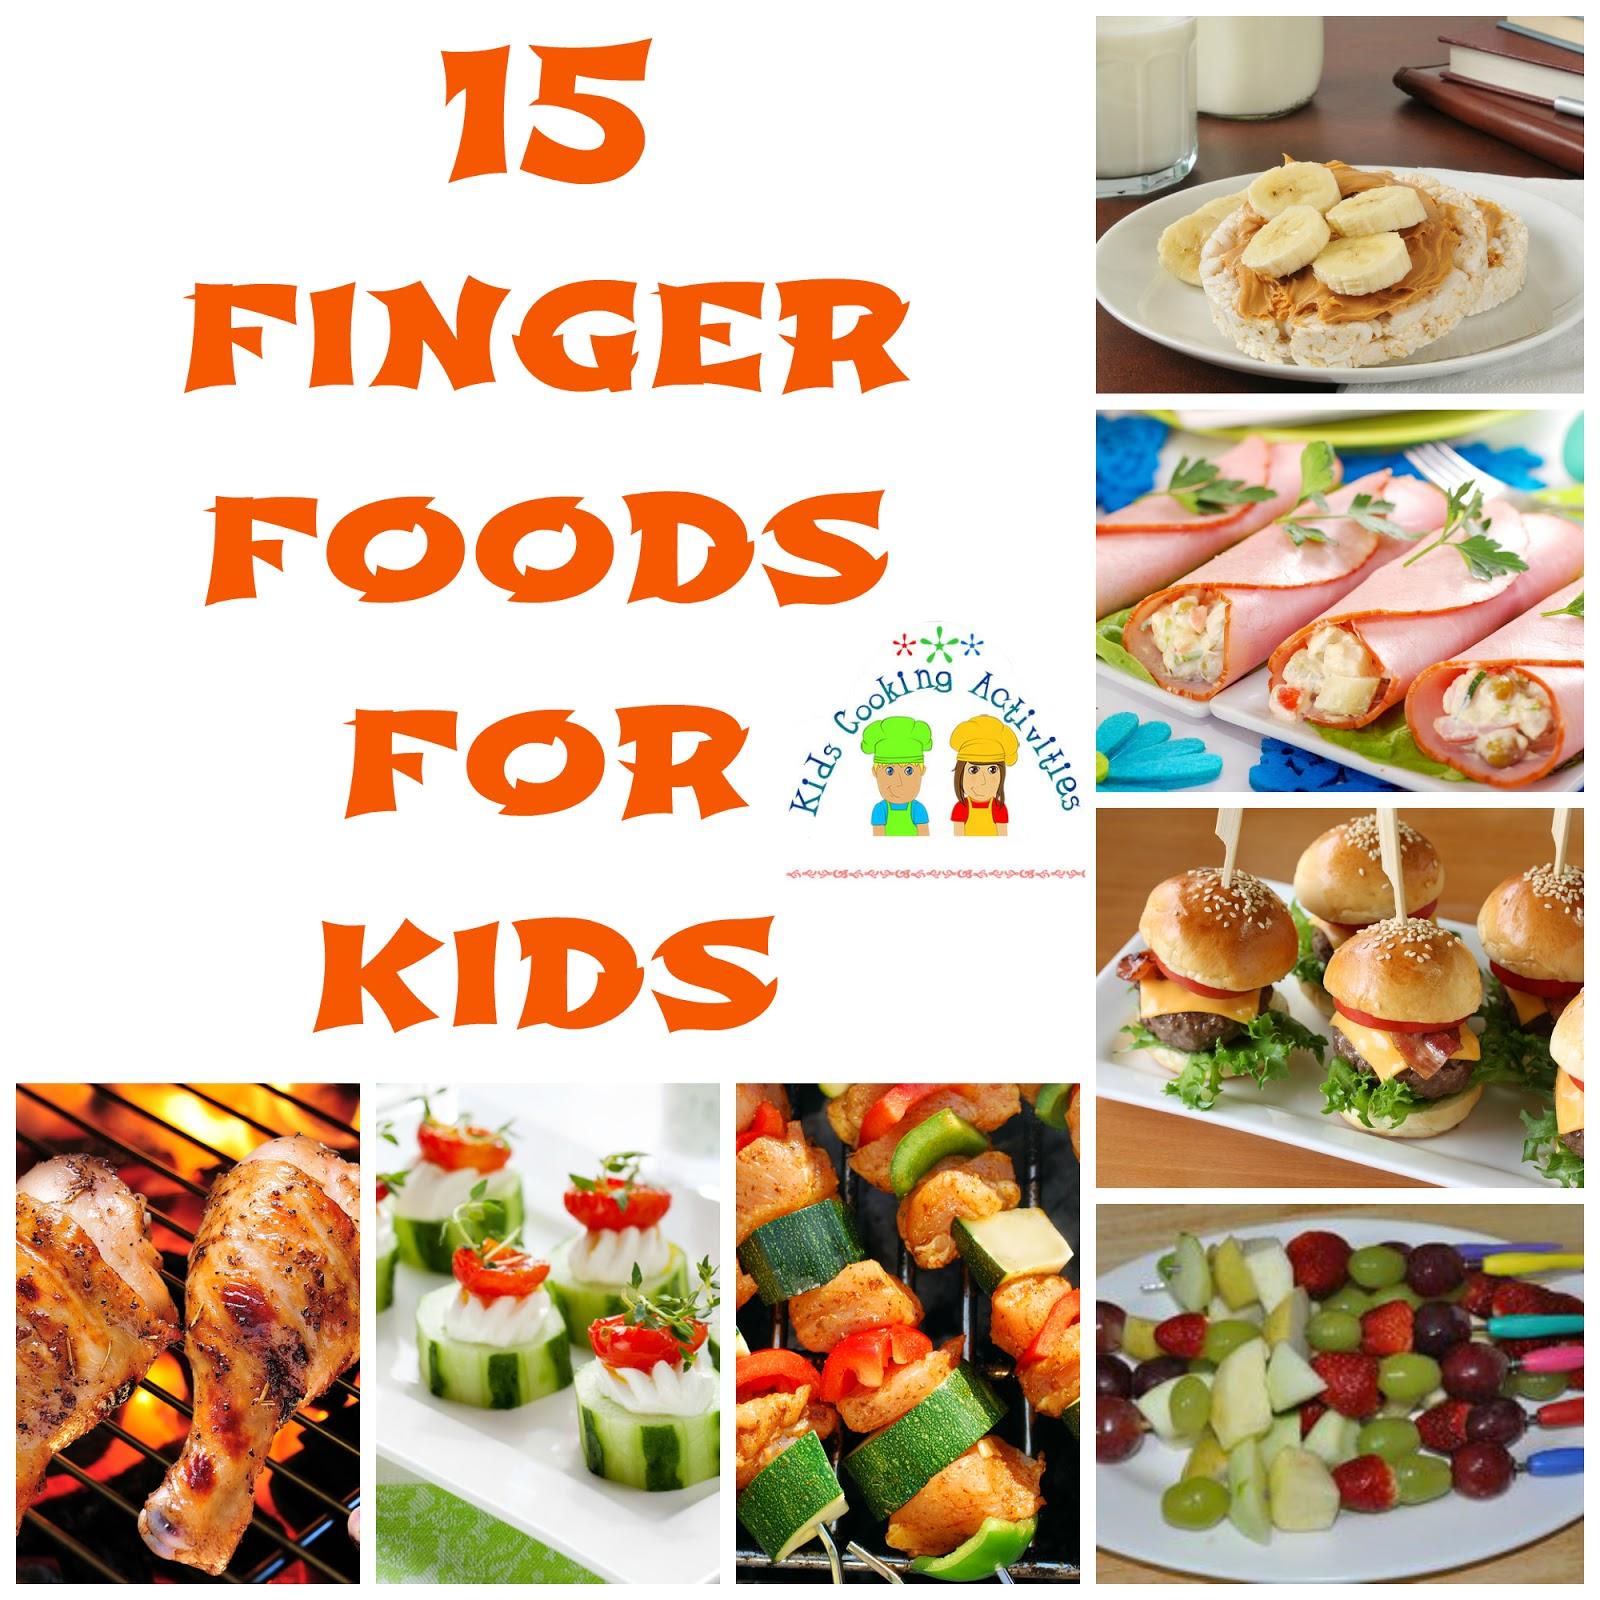 15+ Finger Foods for